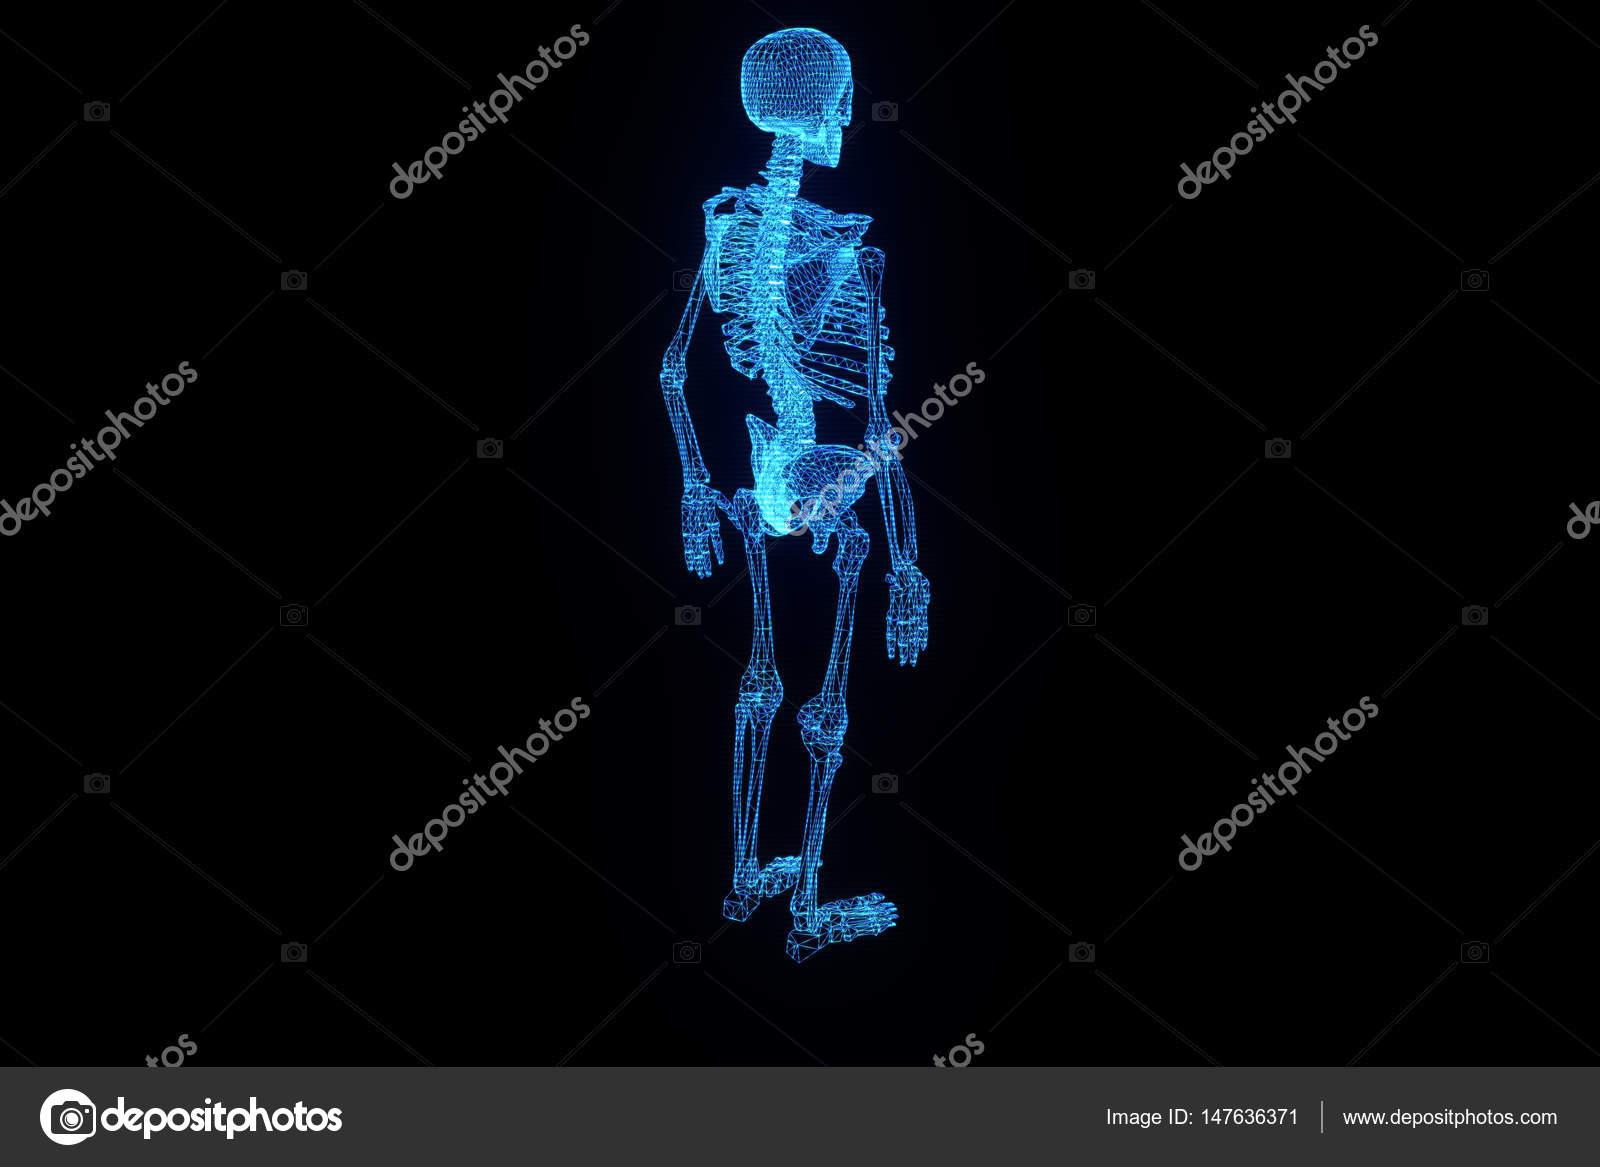 Human Skeleton Wireframe Hologram in Motion  Nice 3D